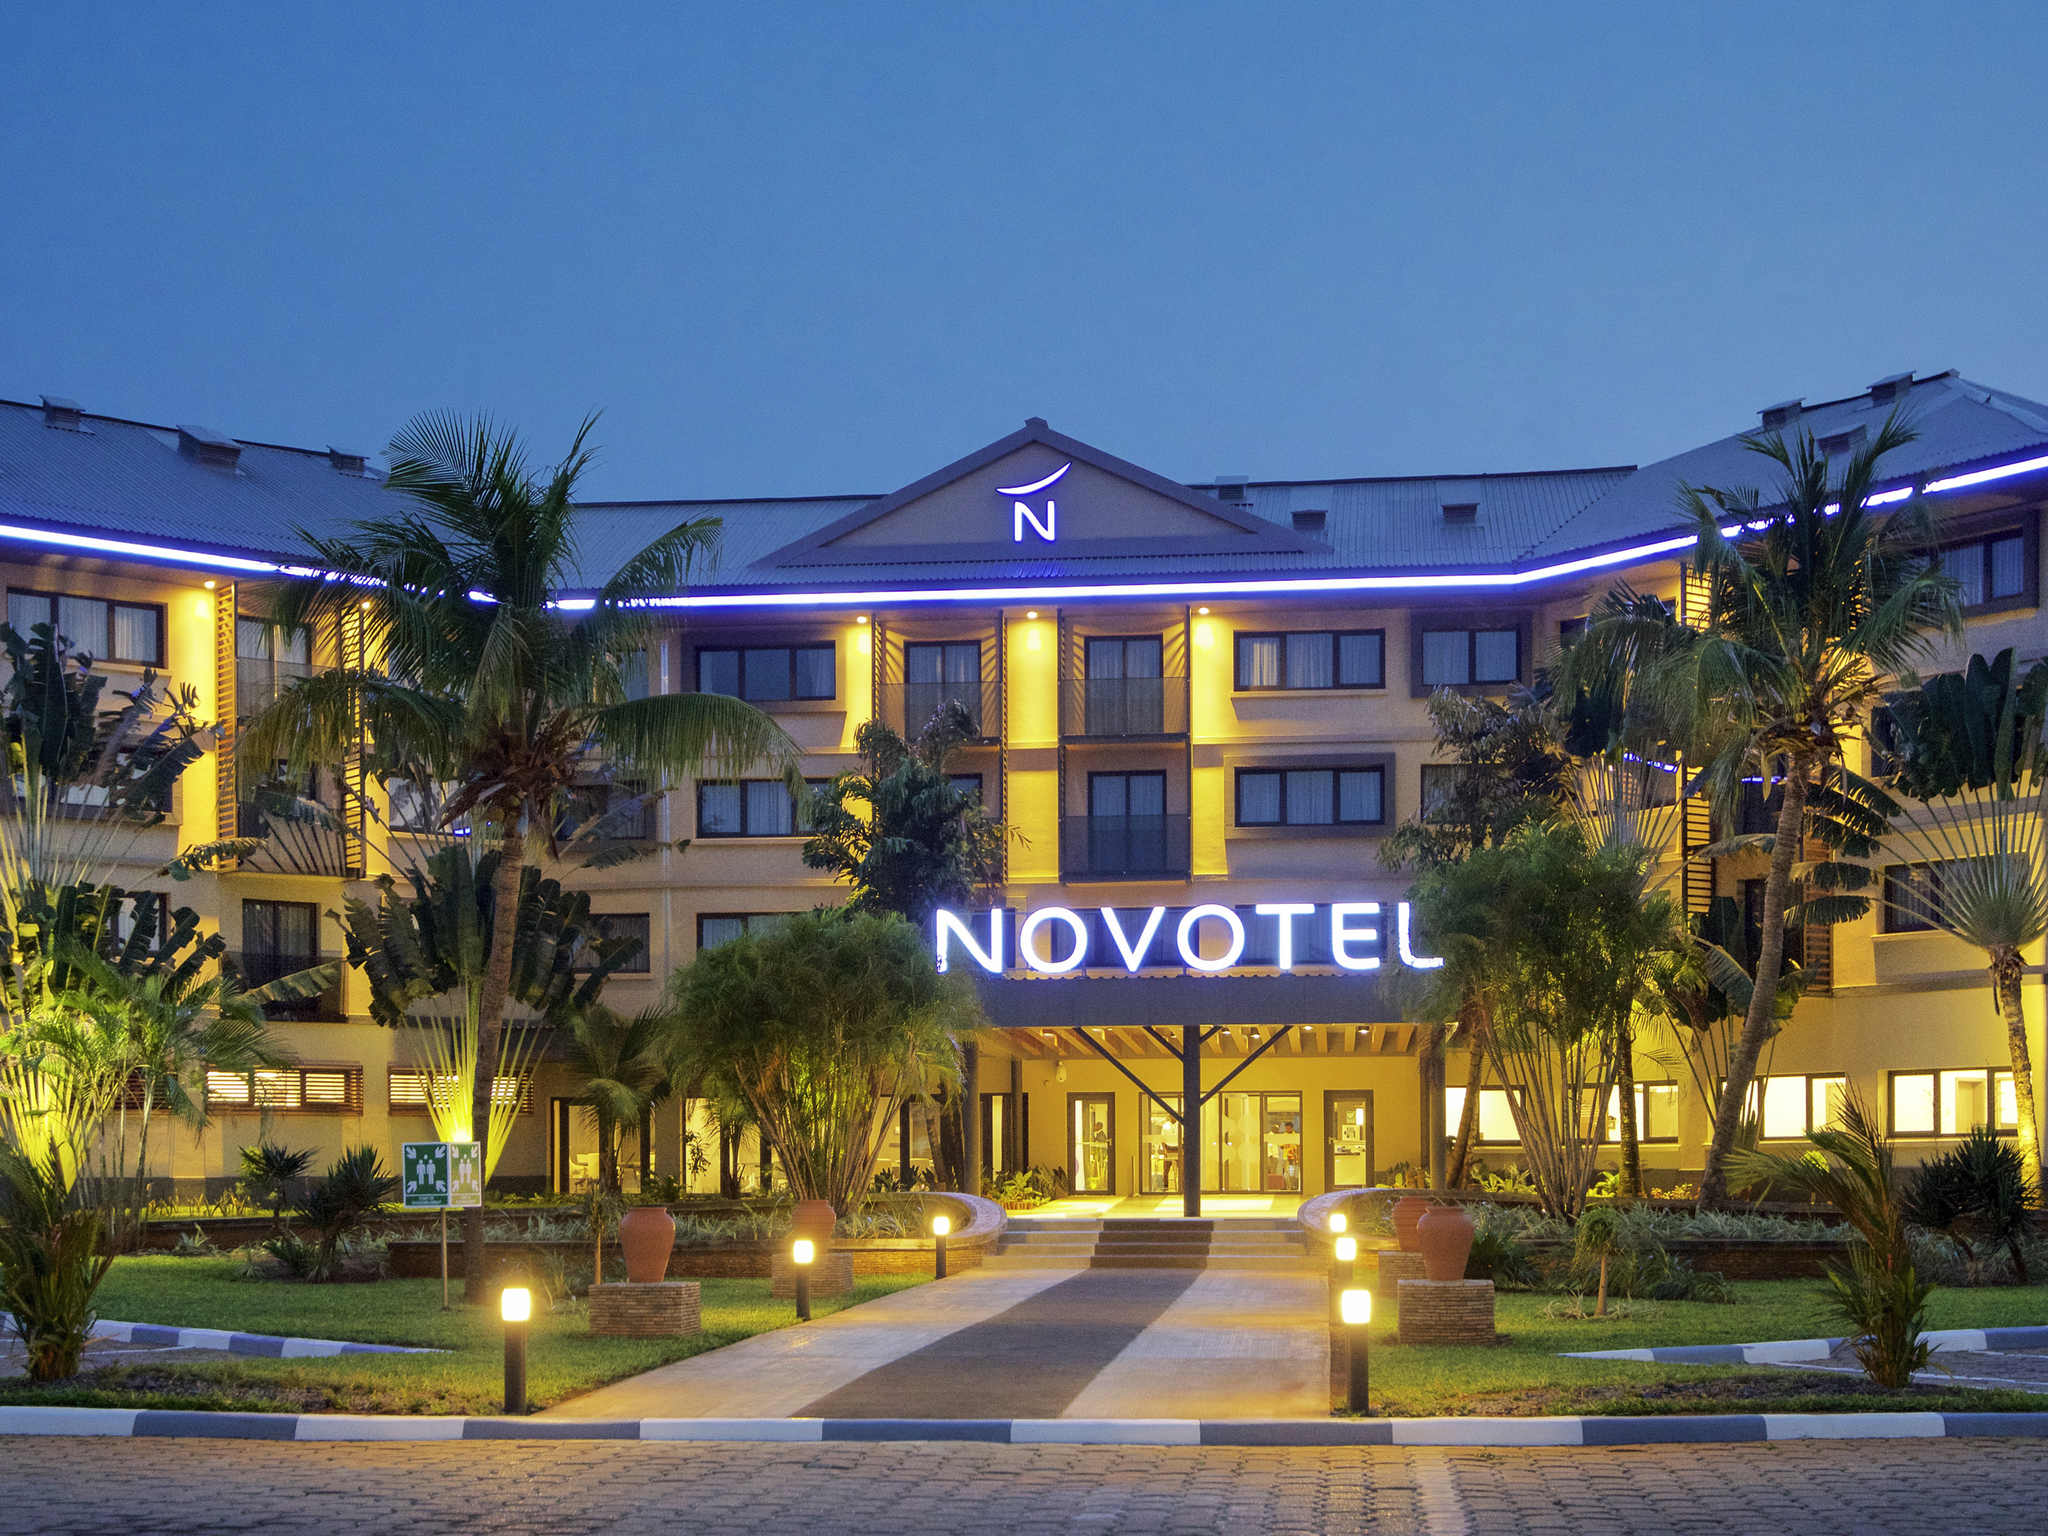 Hotel - Novotel Cotonou Orisha (wegen Renovierung geschlossen)